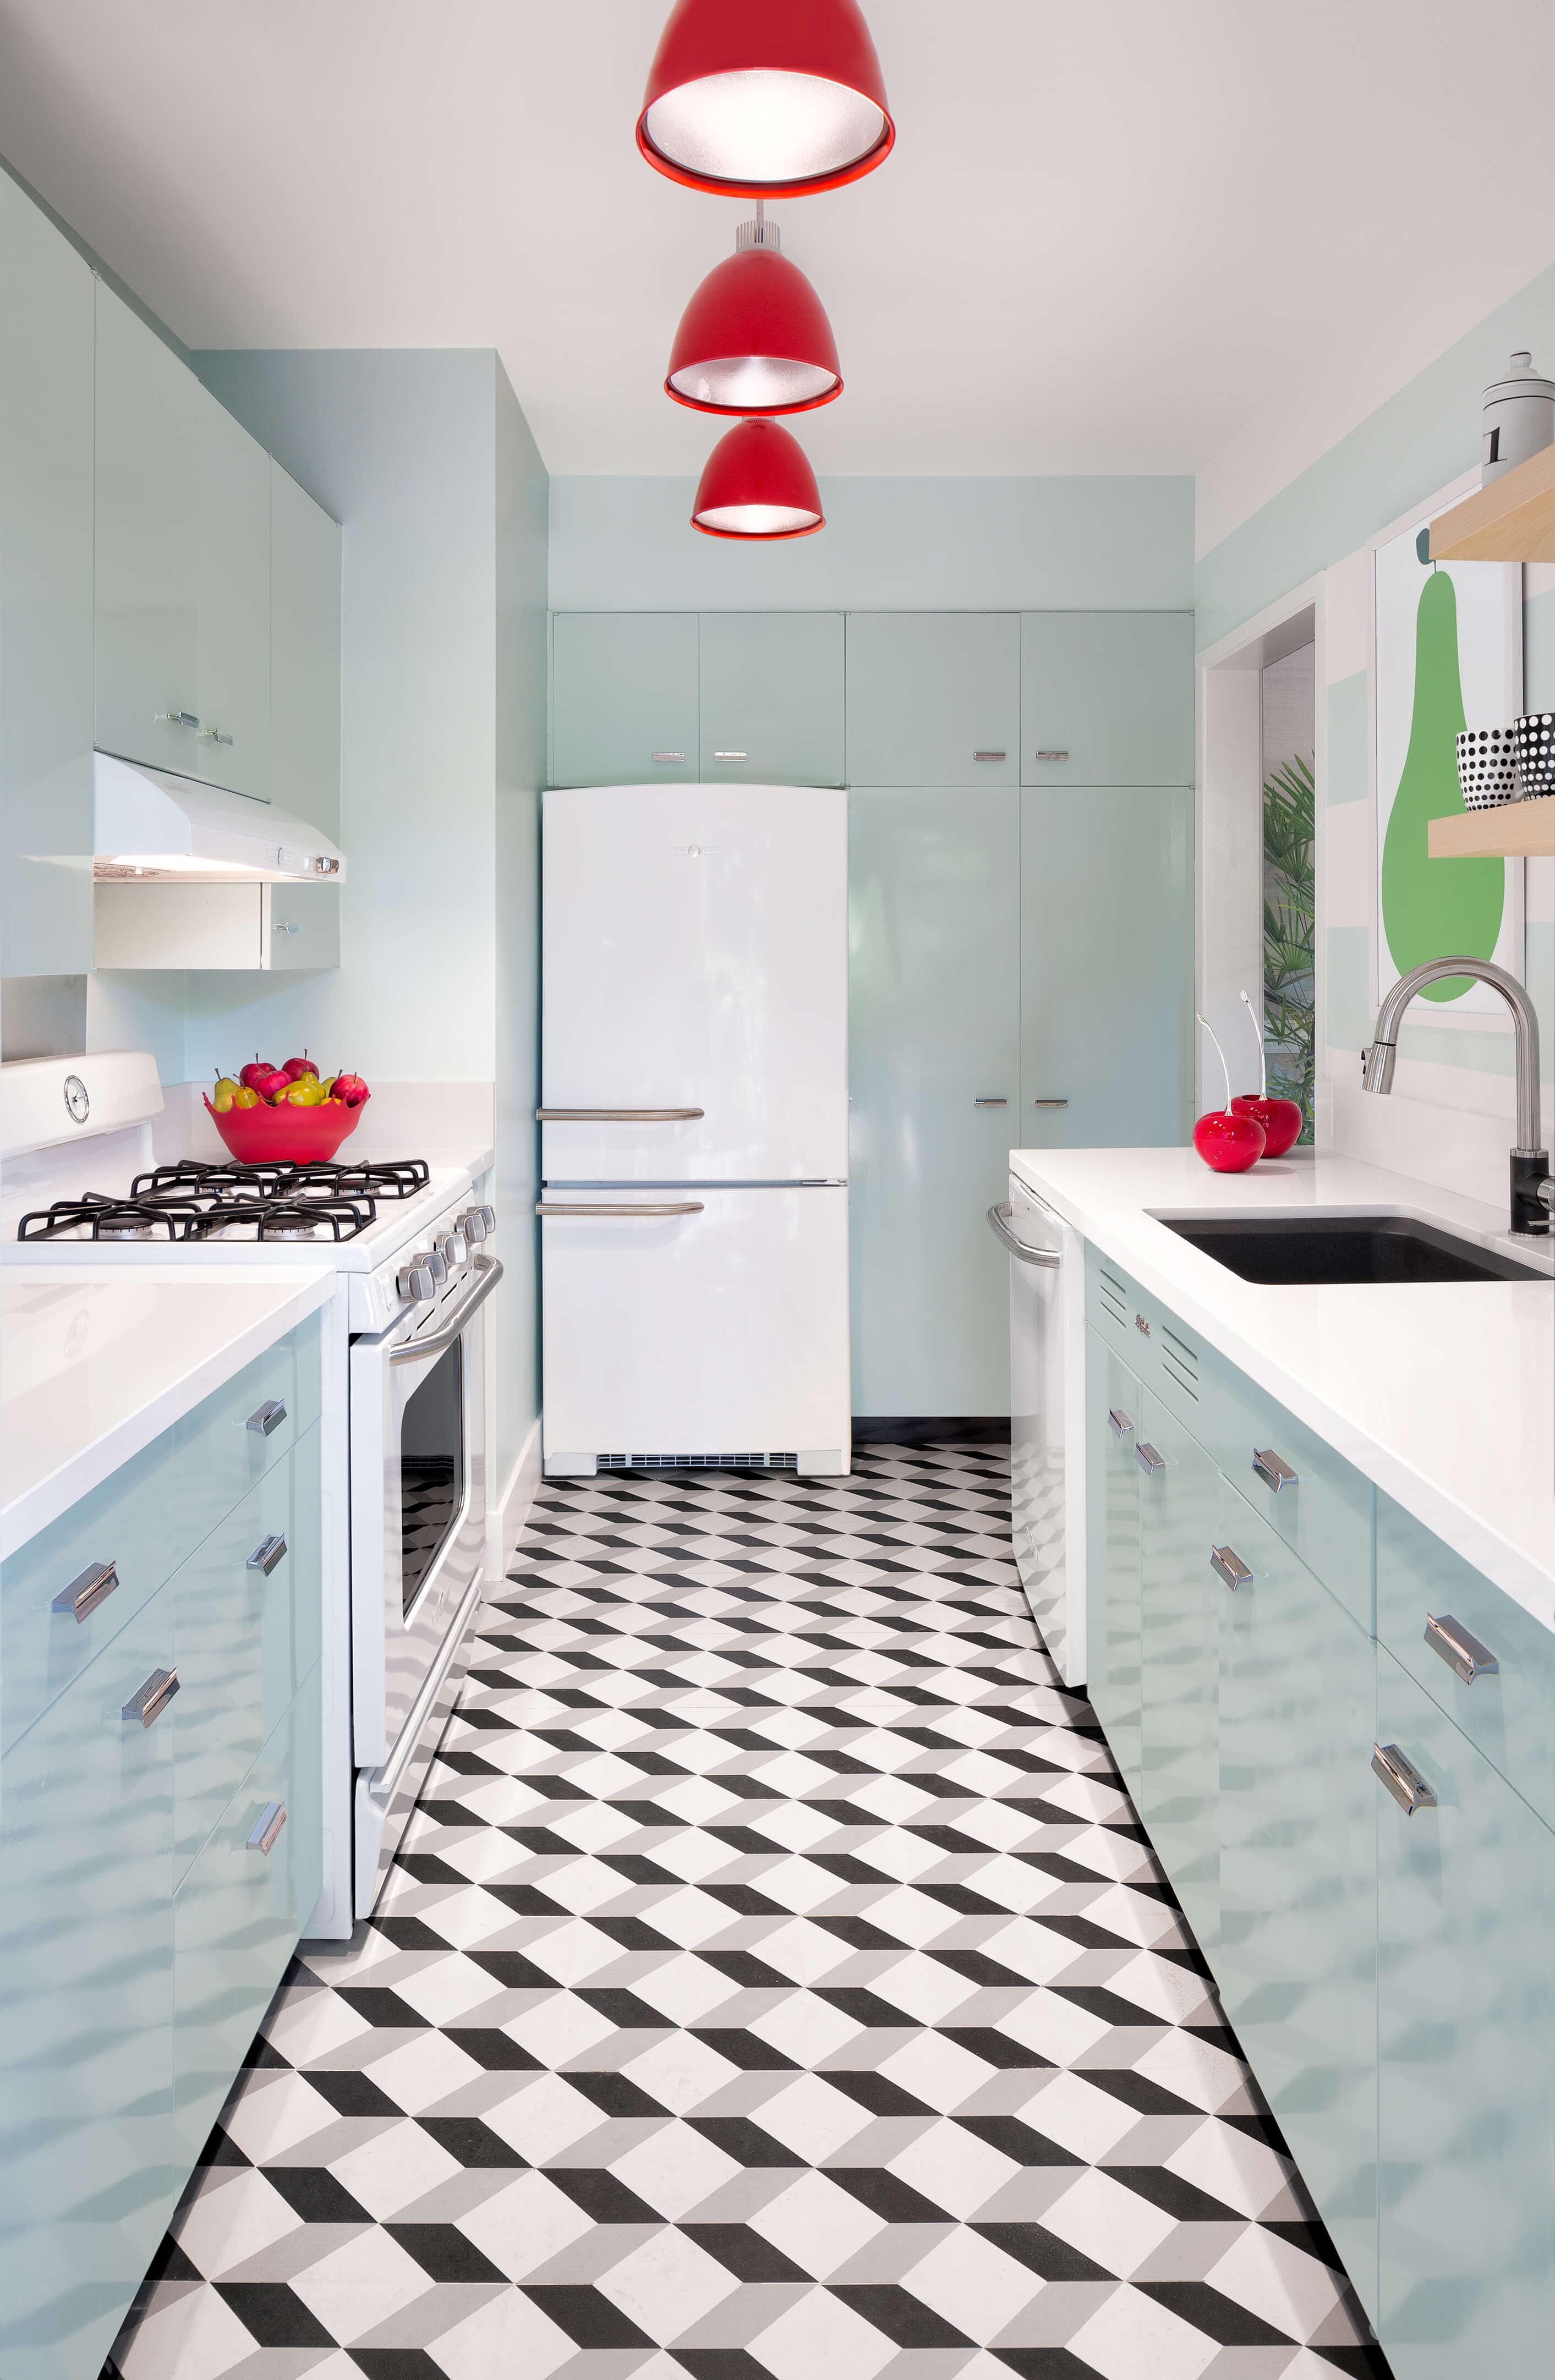 Mid-Century Modern Kitchen Decor Ideas - The Kitchen Witches